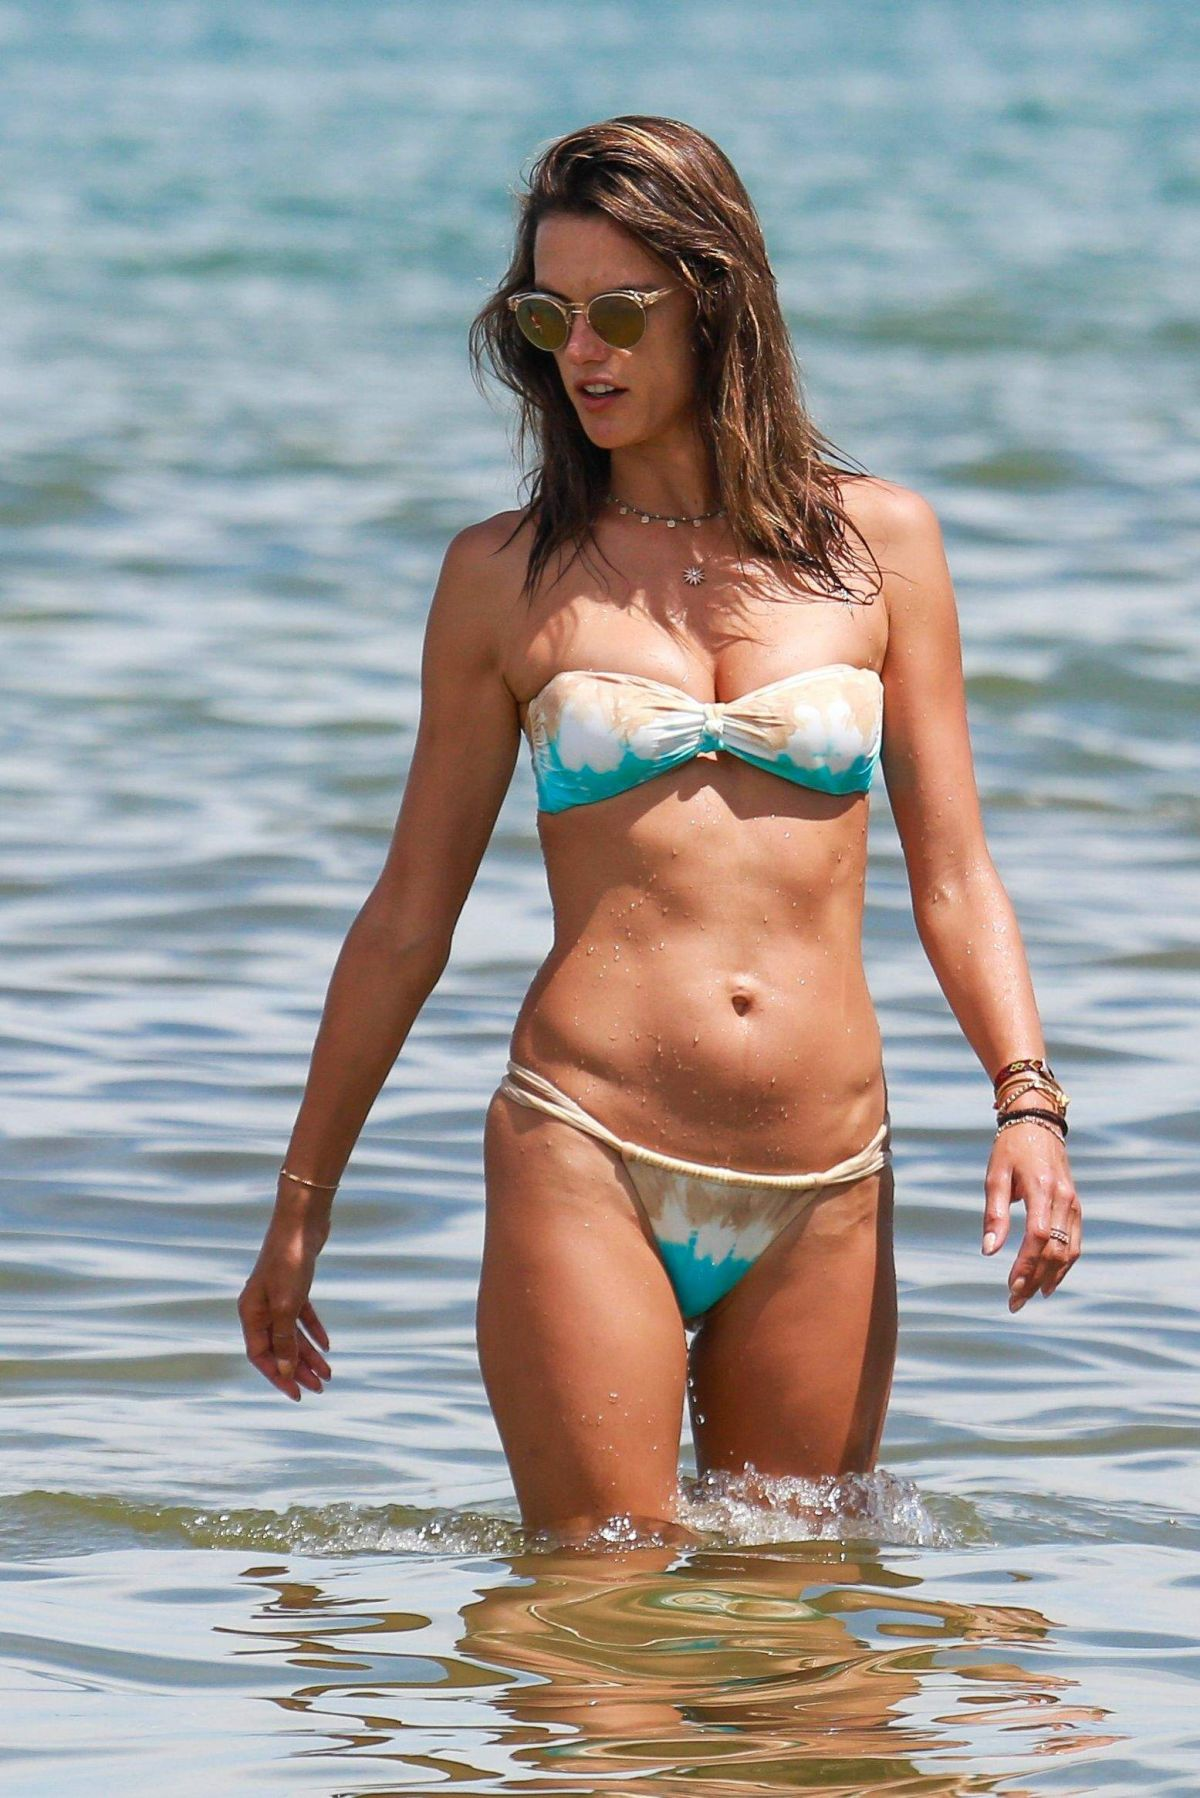 Alessandra Ambrosio in a bikini at the beach in Florianopolis